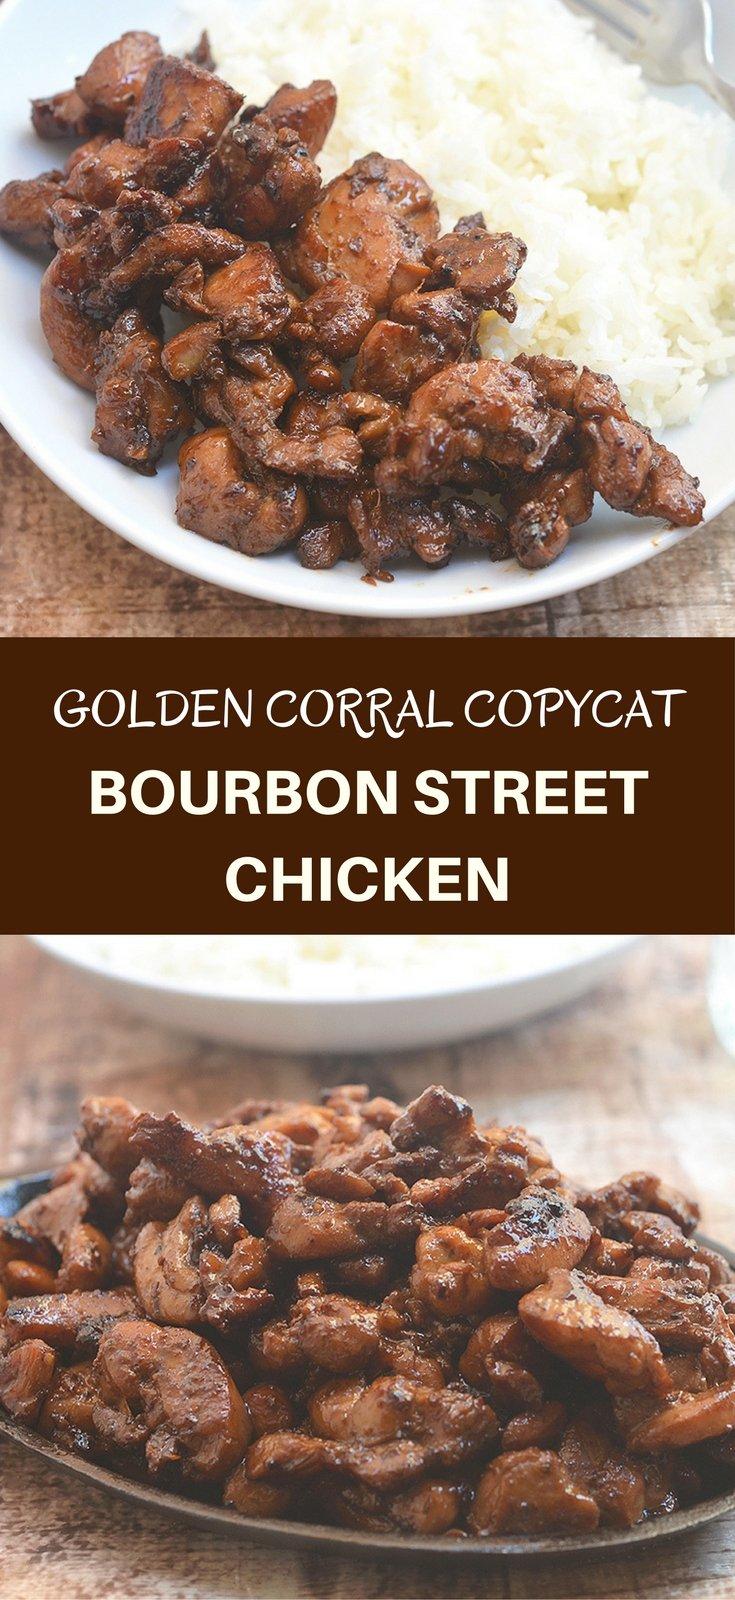 Golden Corral Bourbon Street Chicken Copycat Onion Rings Things